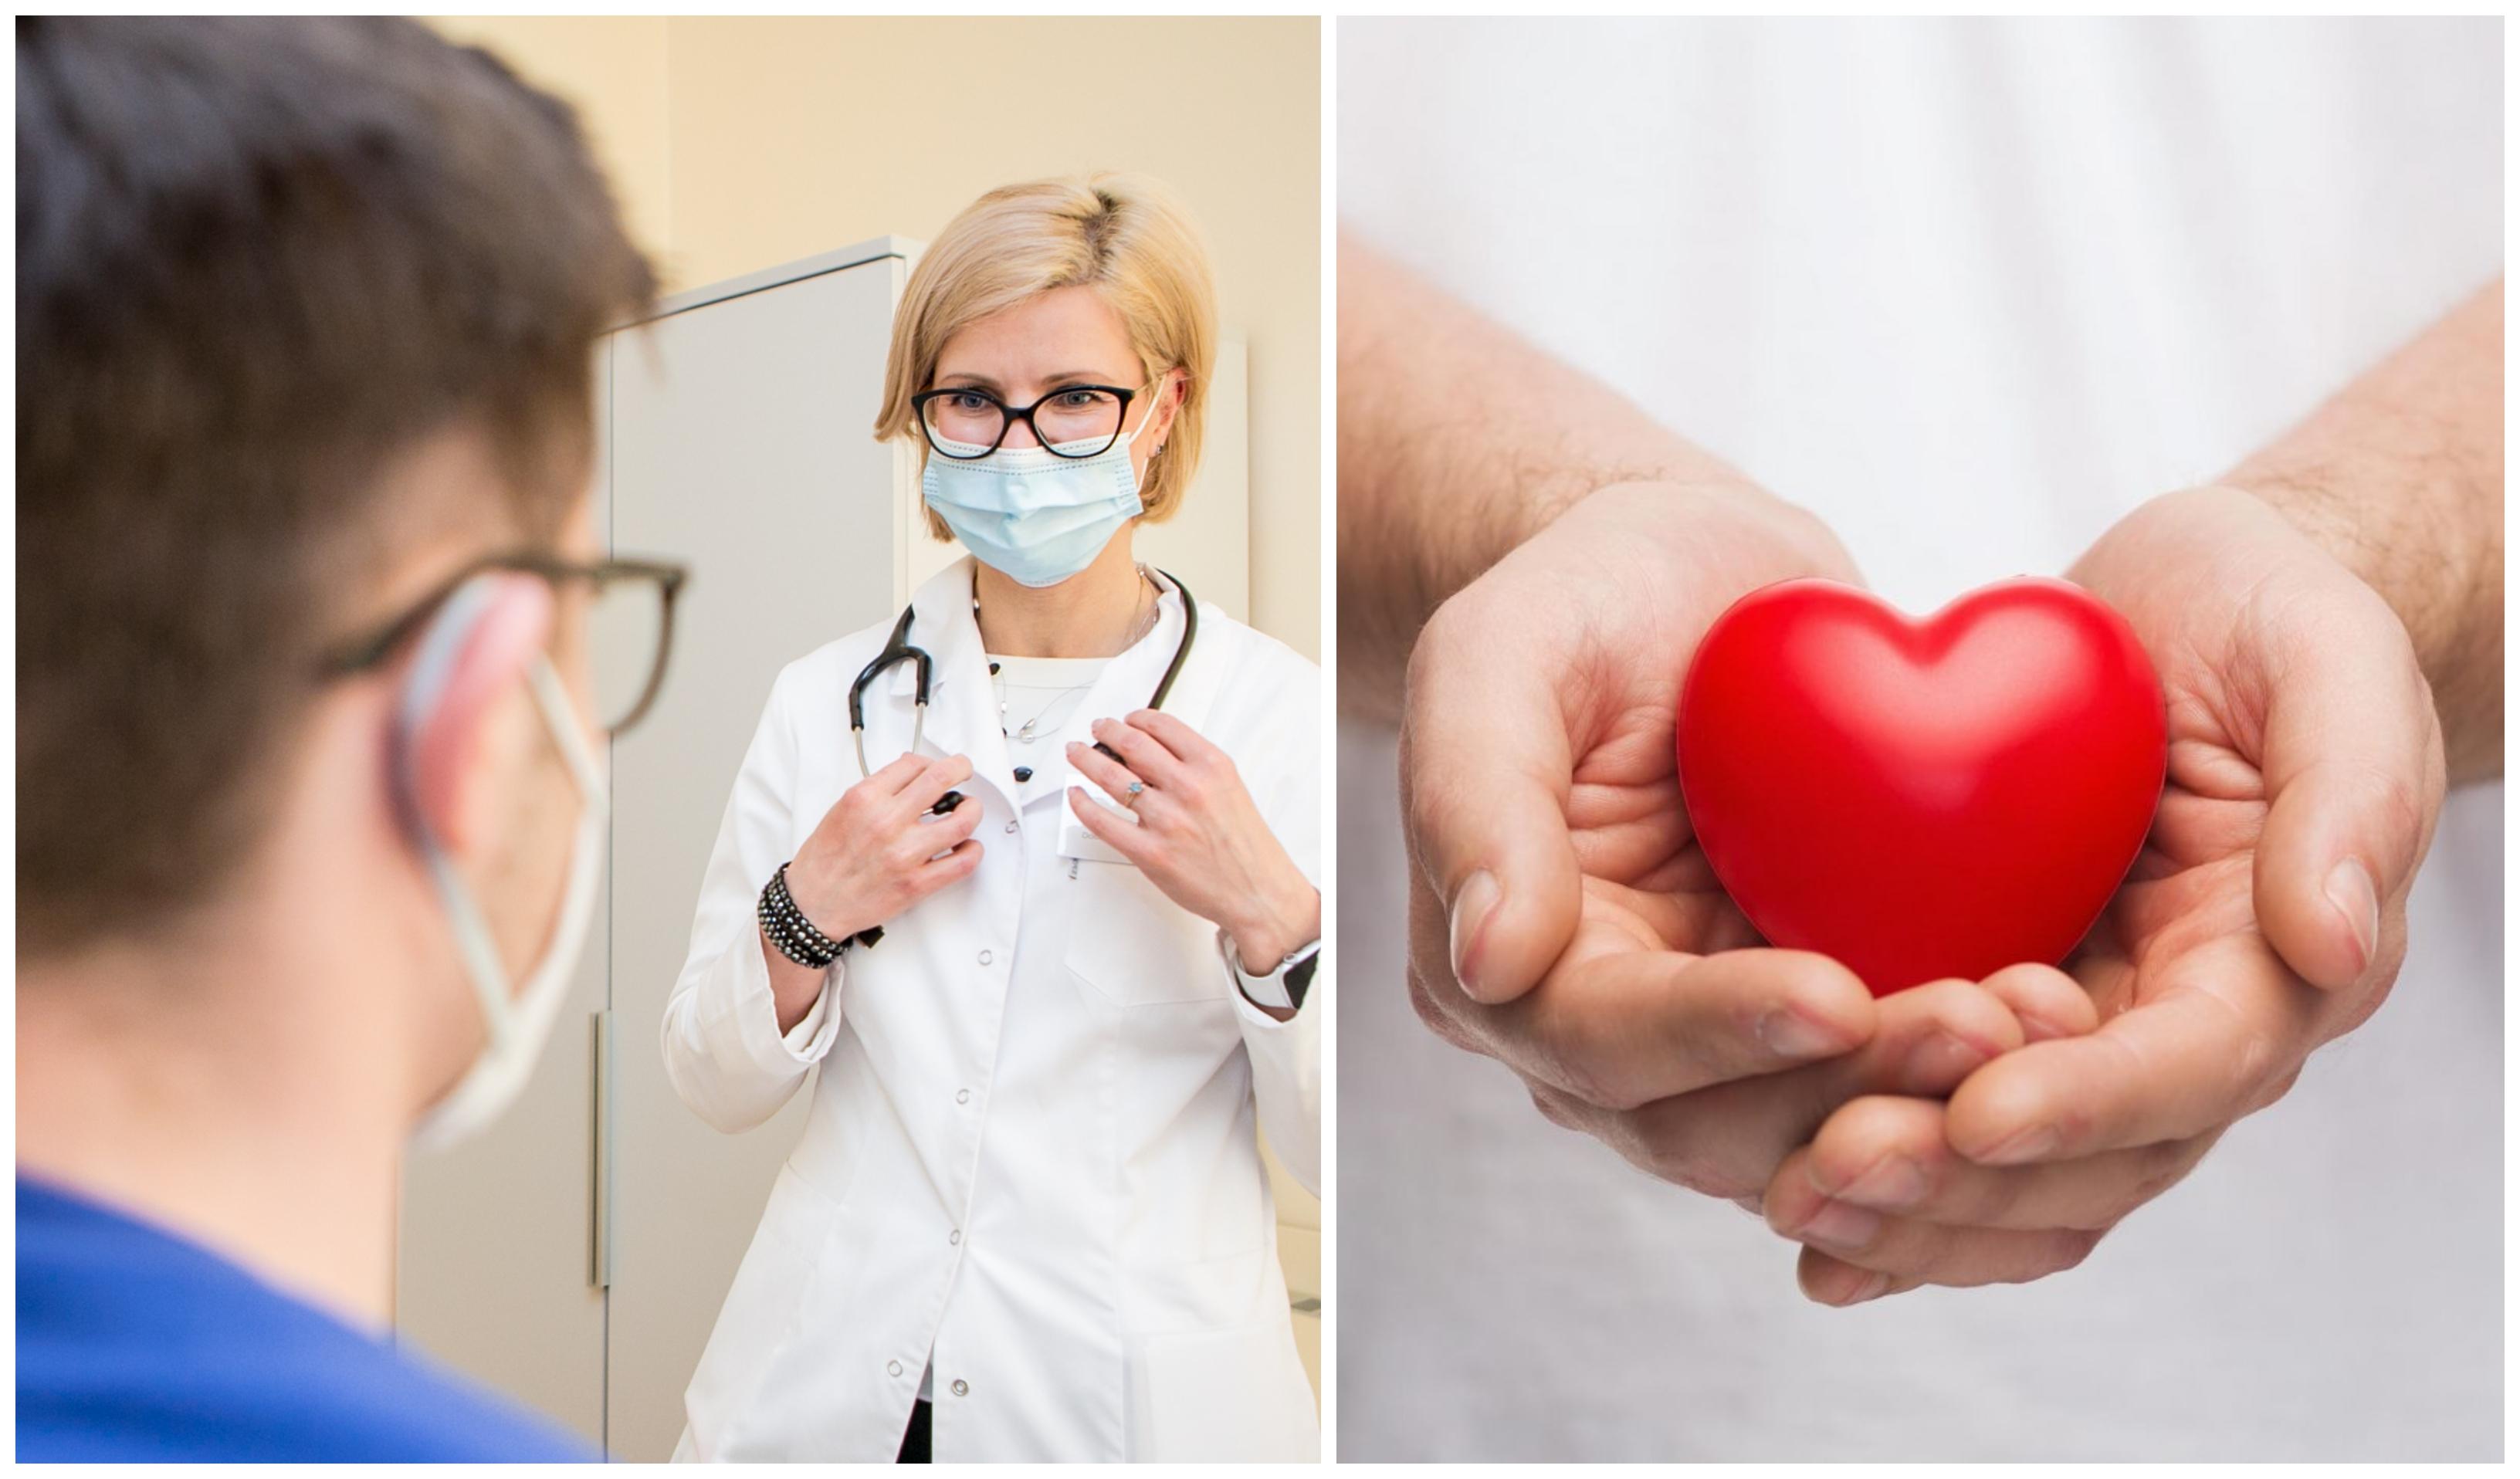 laboratorinė diagnostika ir hipertenzija išsamiai apie hipertenziją